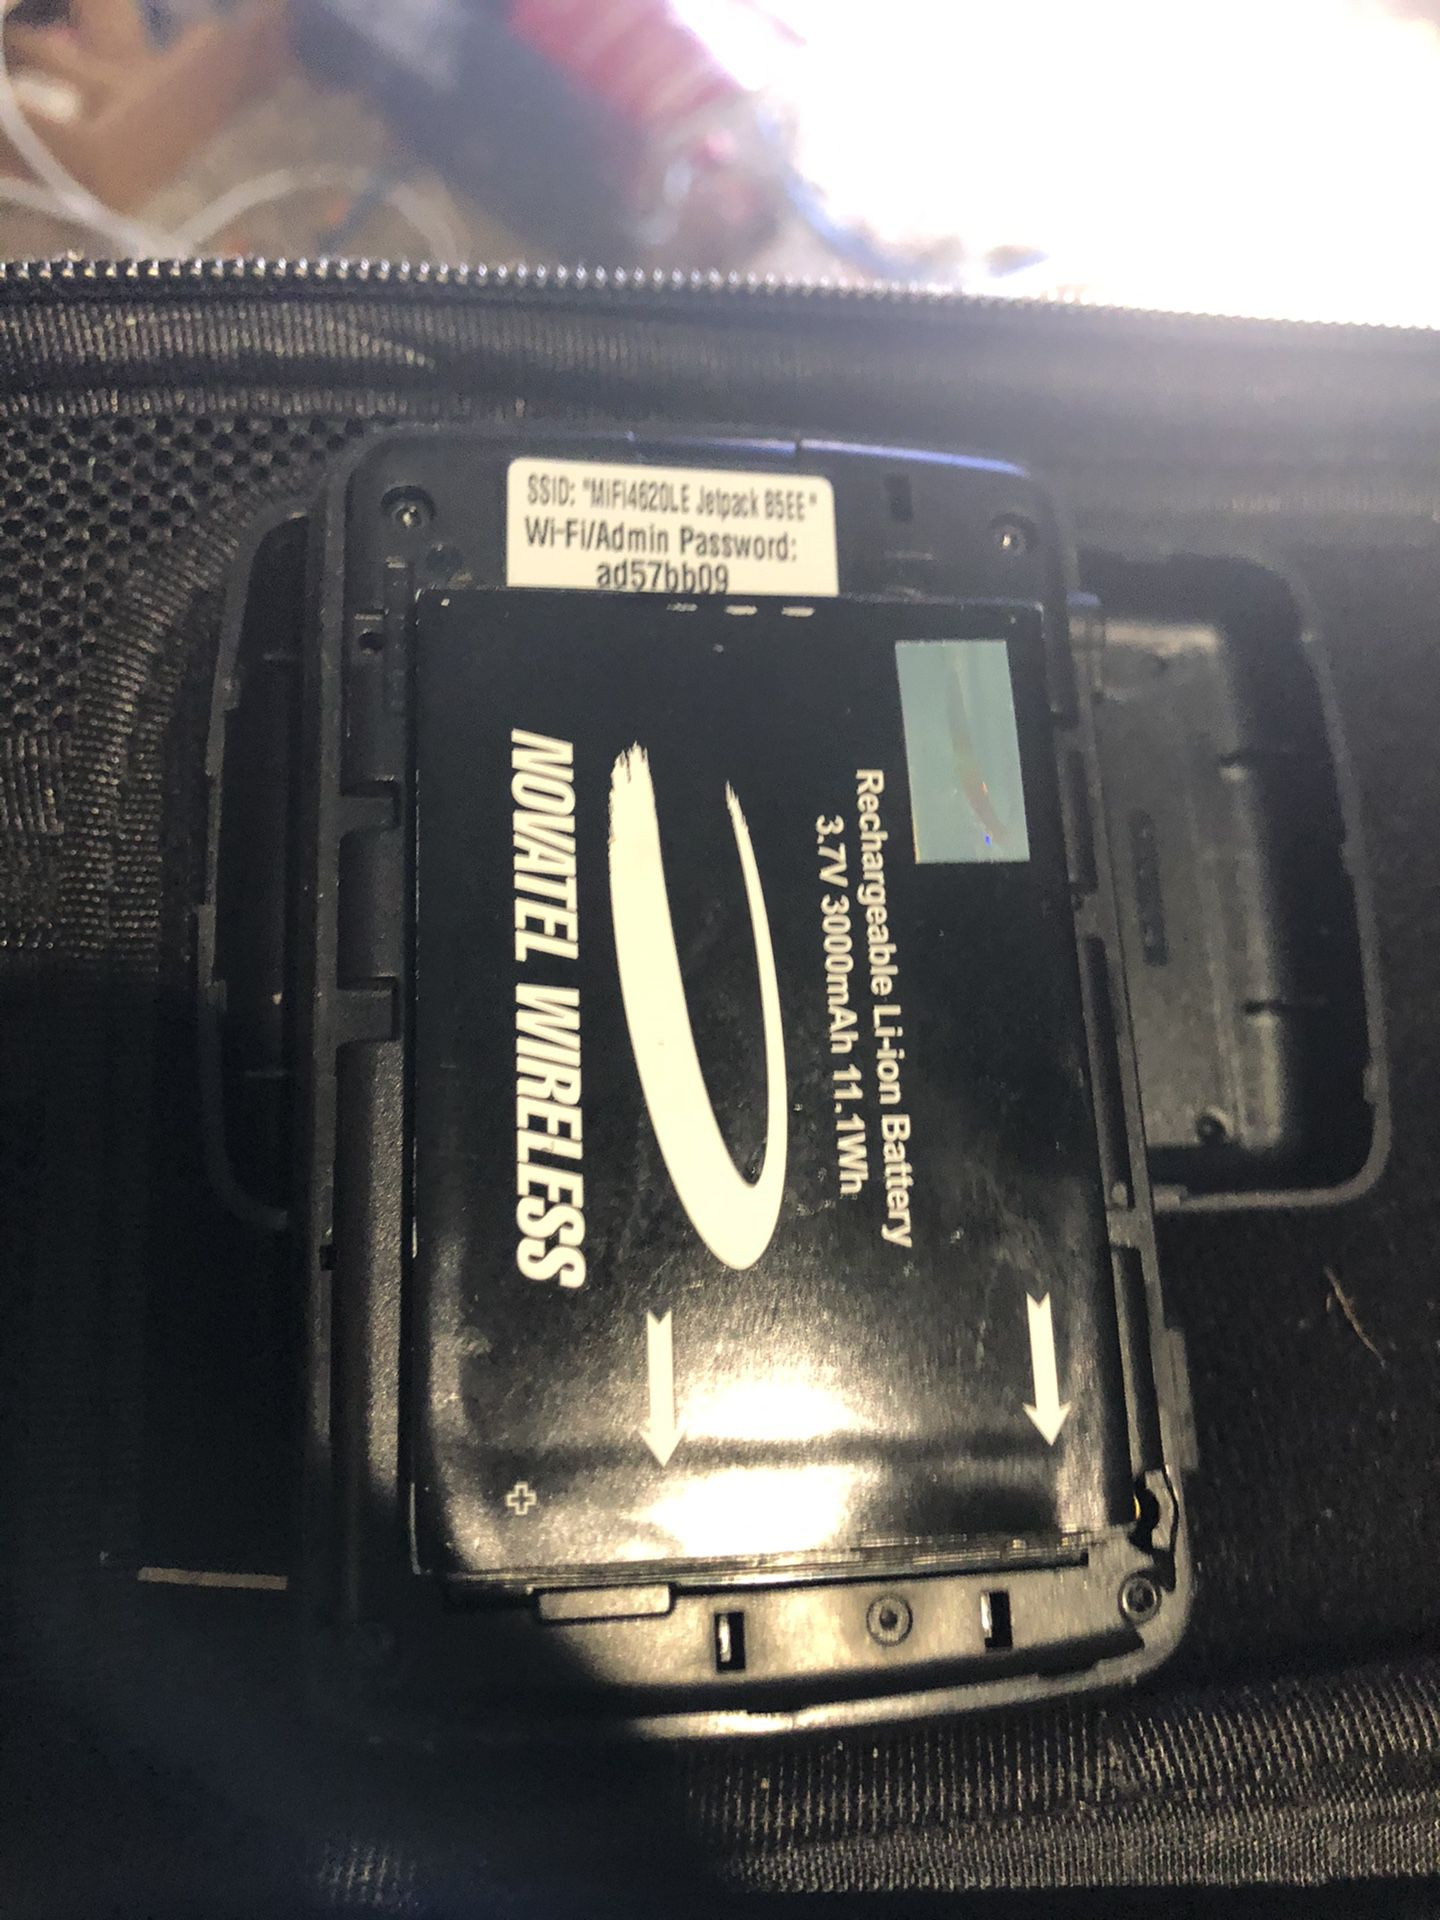 Verizon Jet pack Mifi Hot Spot